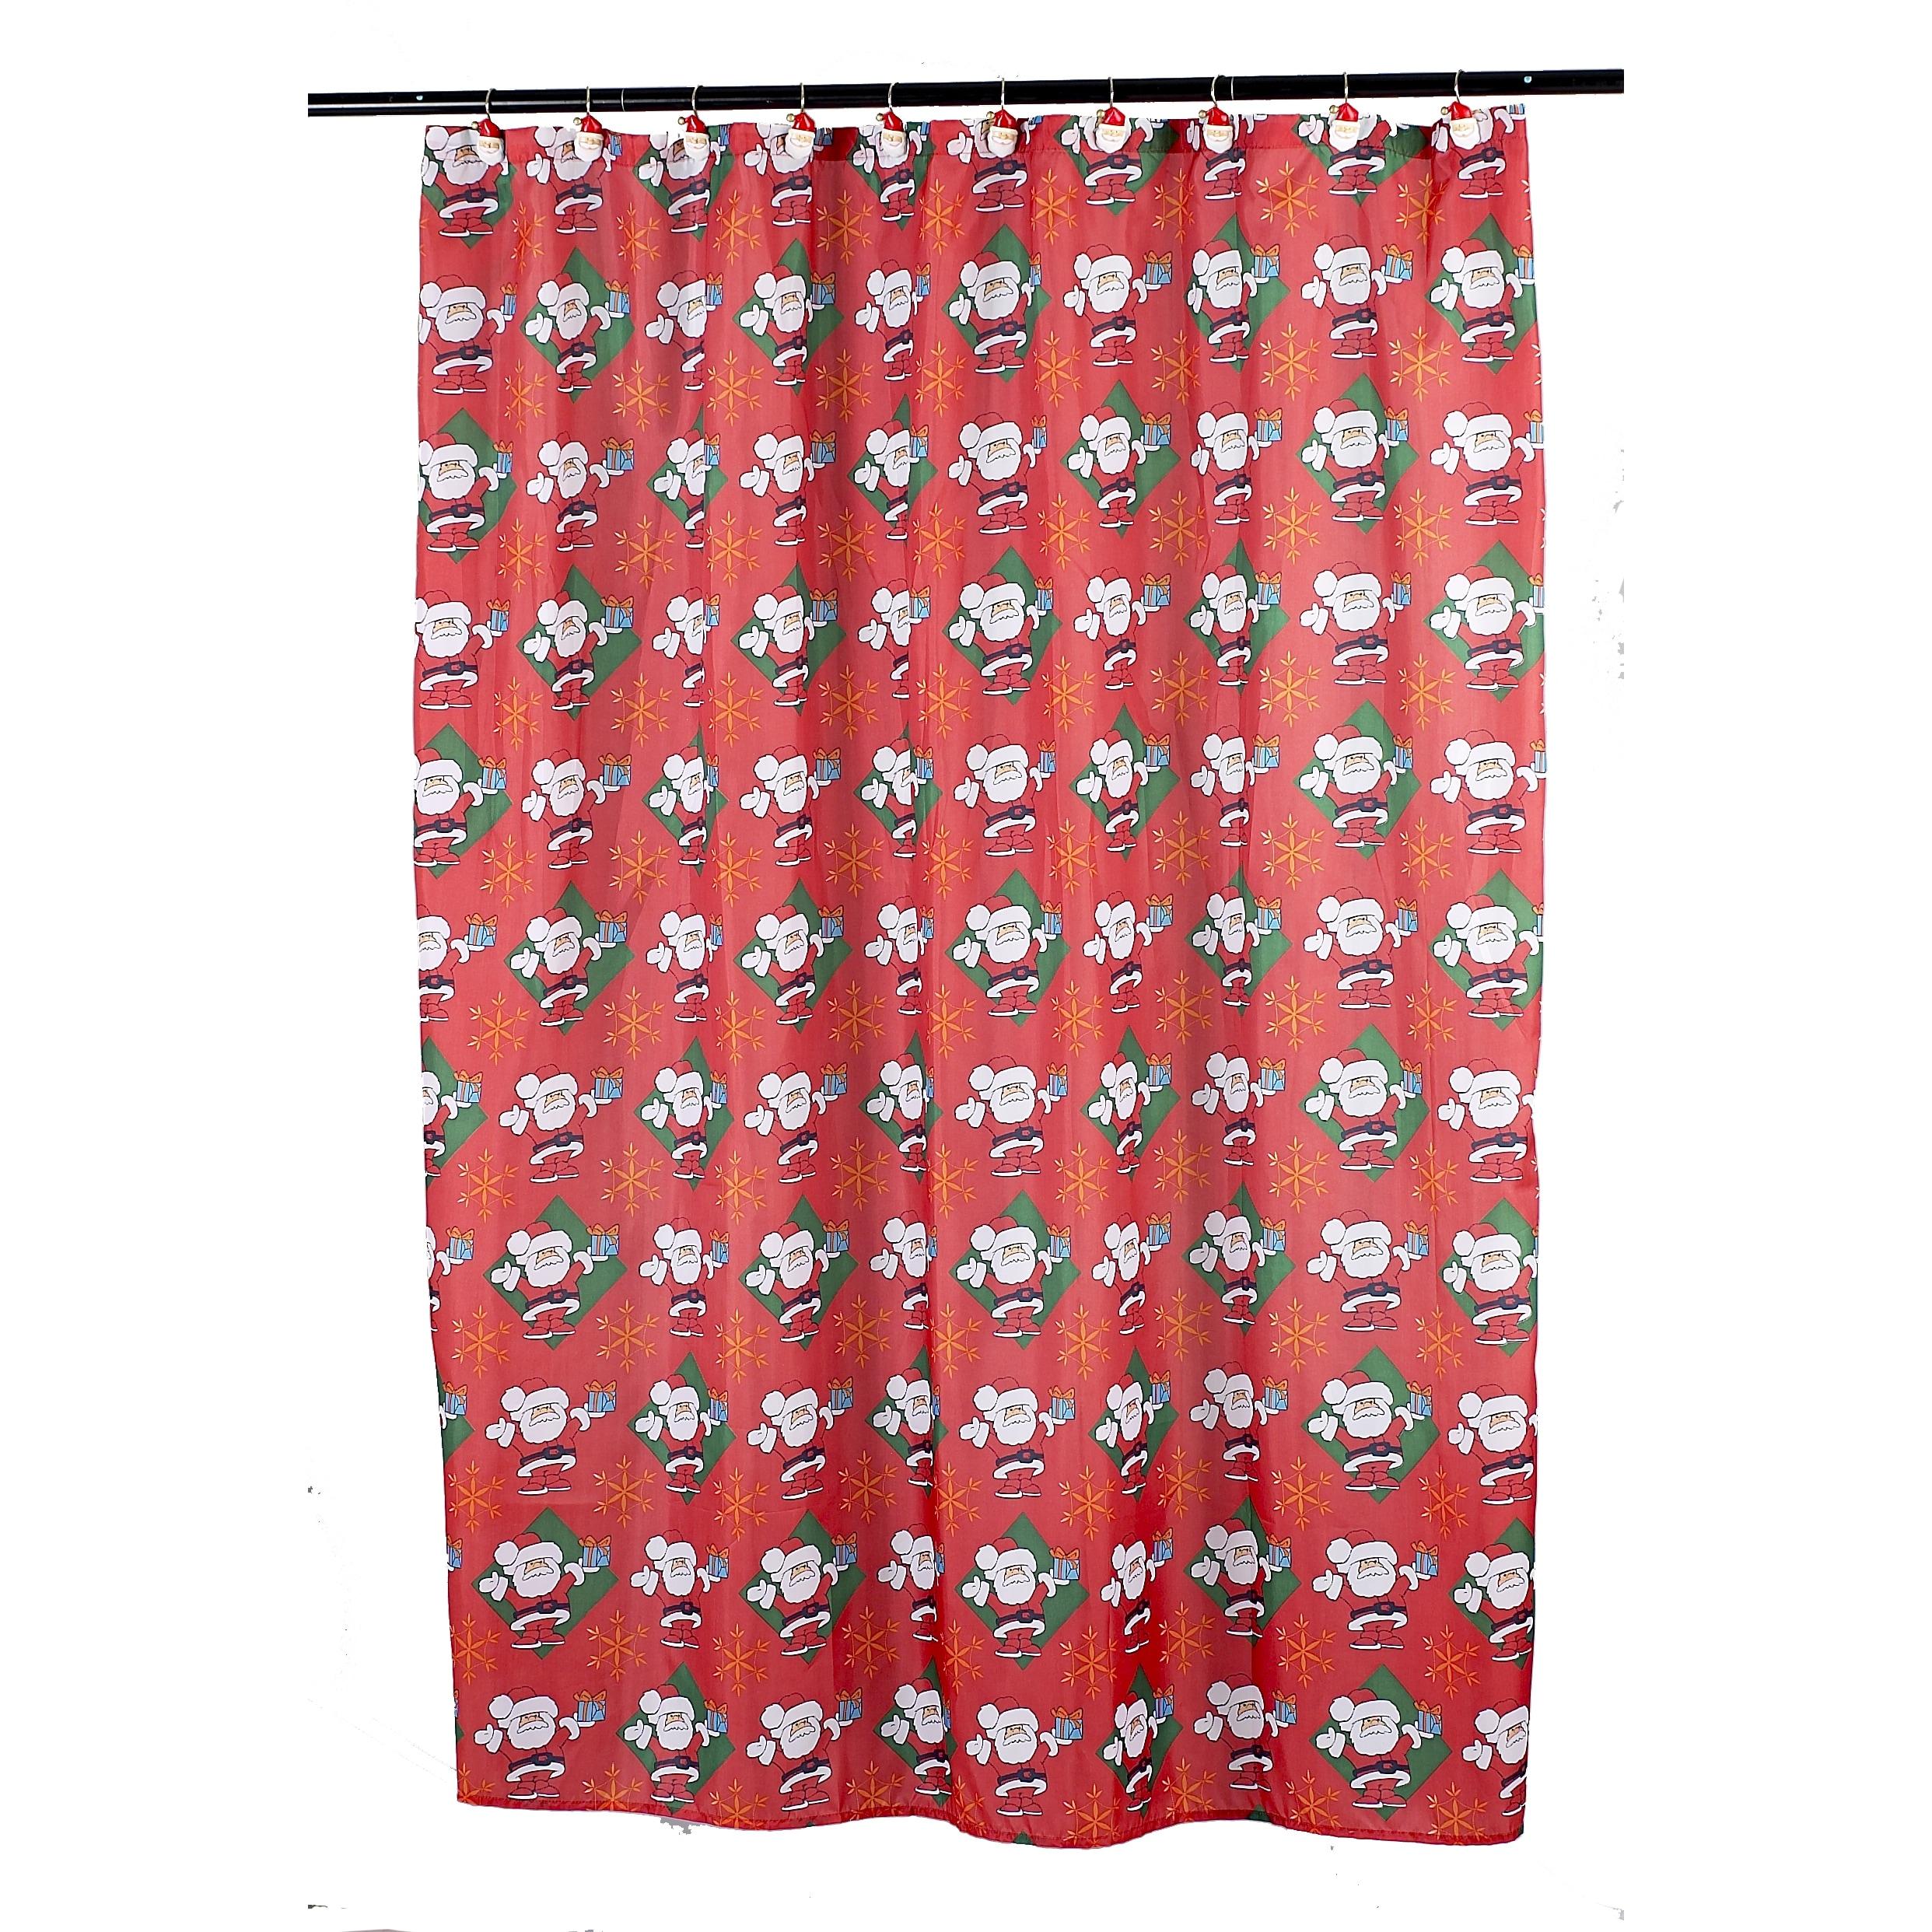 14 Piece Christmas Santa Claus Holiday Themed Shower Curtain Ensemble